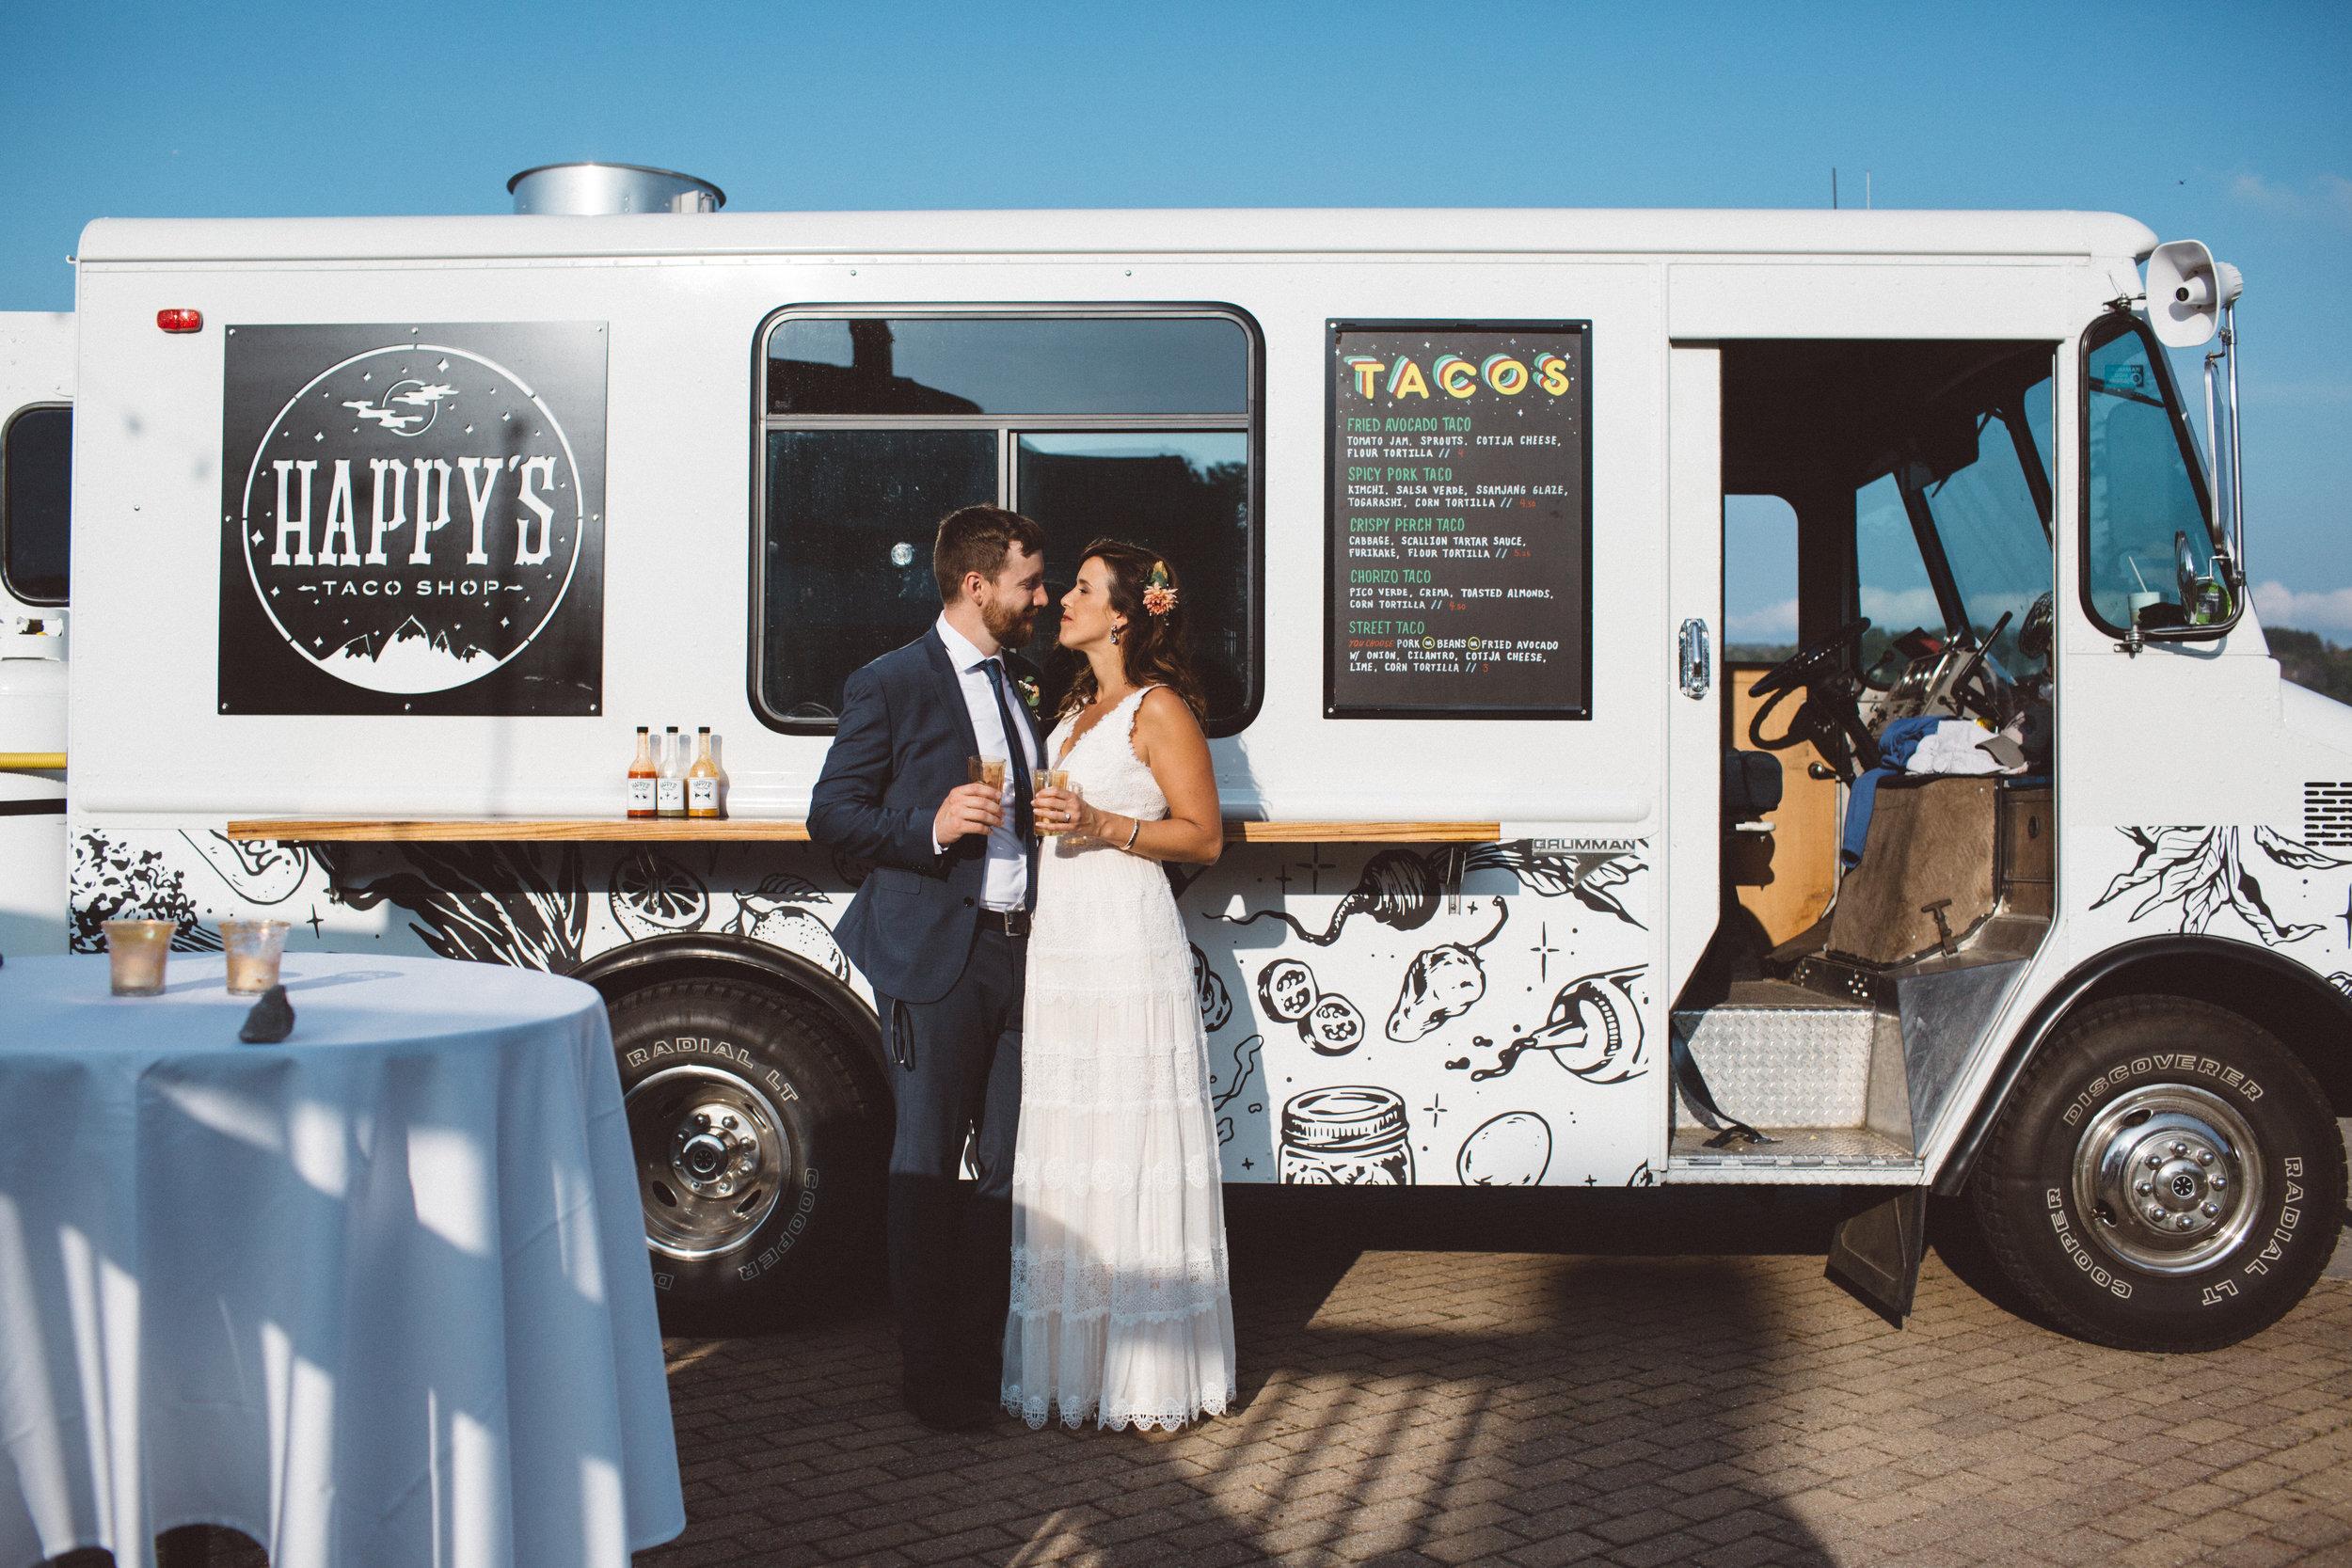 michigan-wedding-photographer-photographers-destination-top-best-battle-creek-kalamazoo